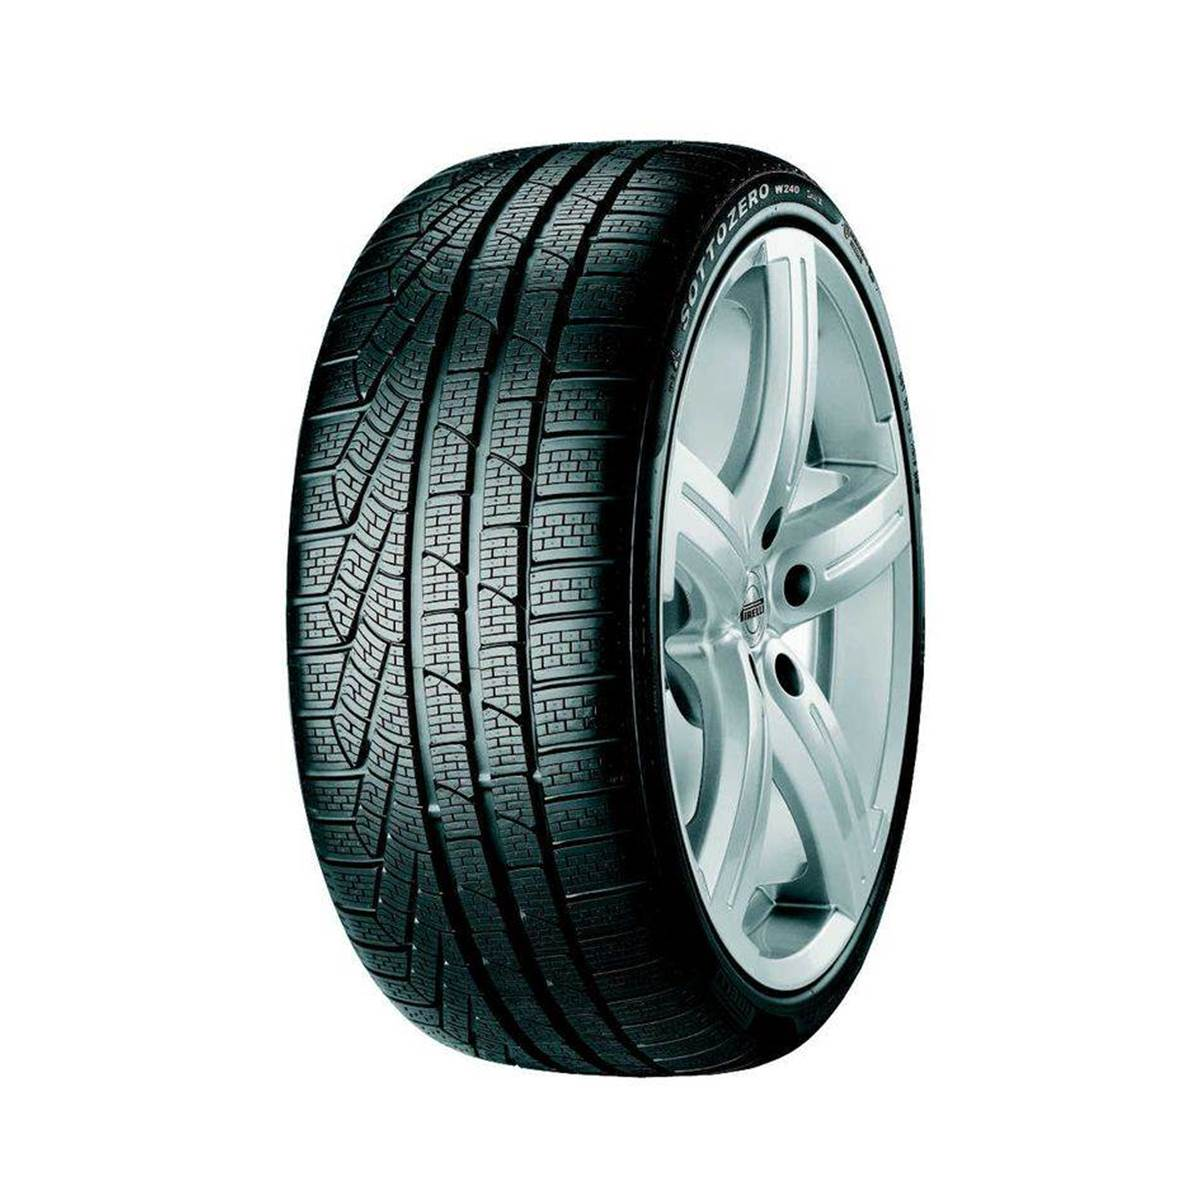 achat pneu pirelli winter 210 sottozero ii 205 60 r16 92h pas cher. Black Bedroom Furniture Sets. Home Design Ideas